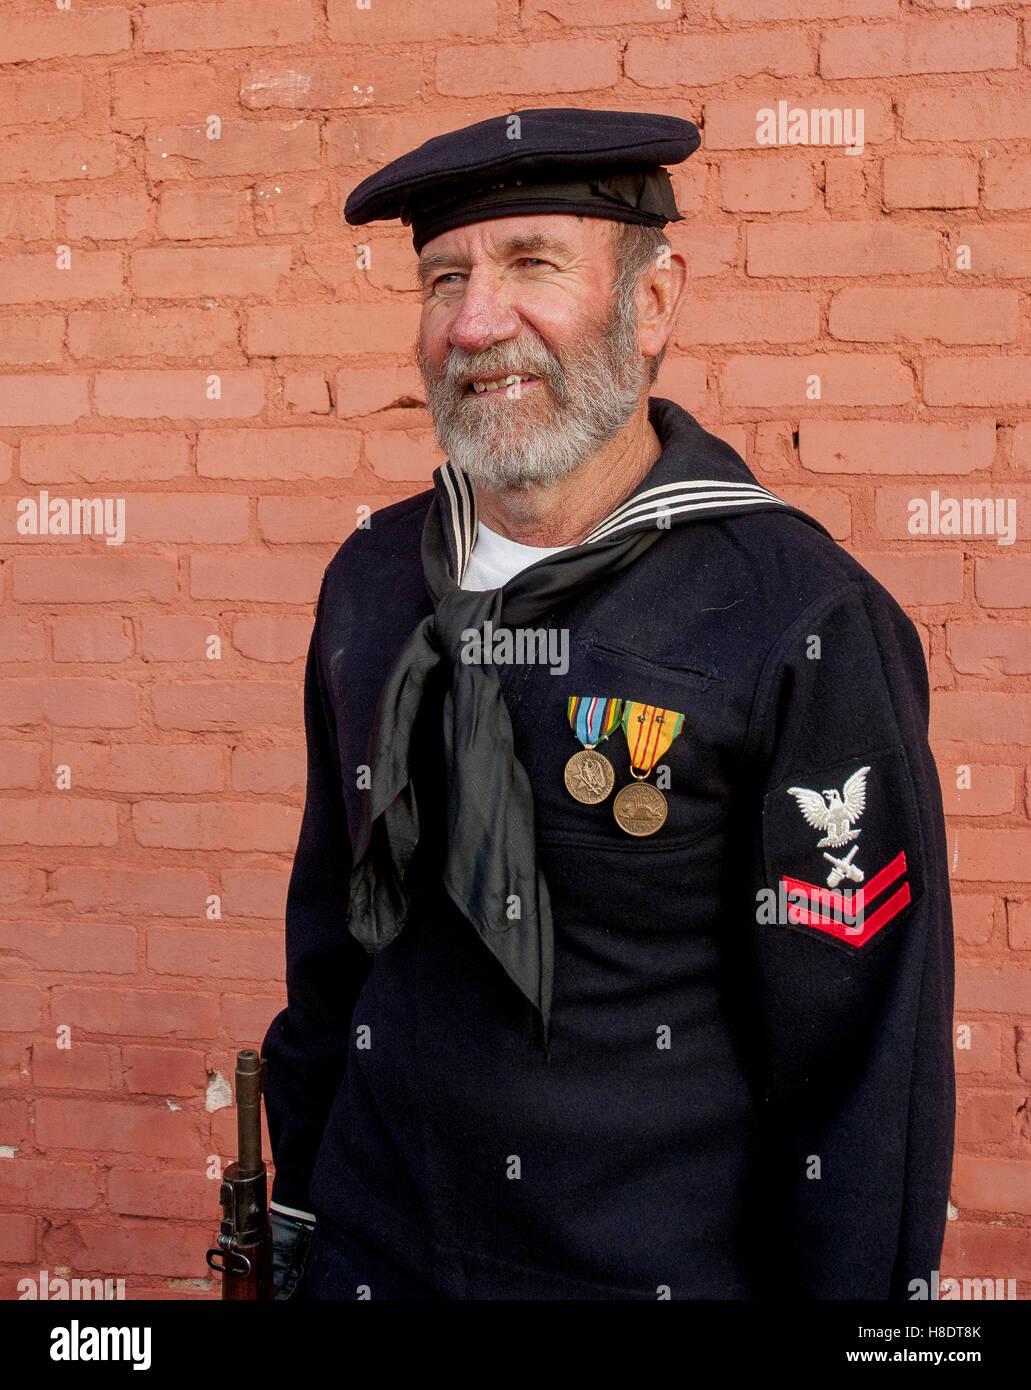 Navy Dress Uniform Stock Photos Amp Navy Dress Uniform Stock